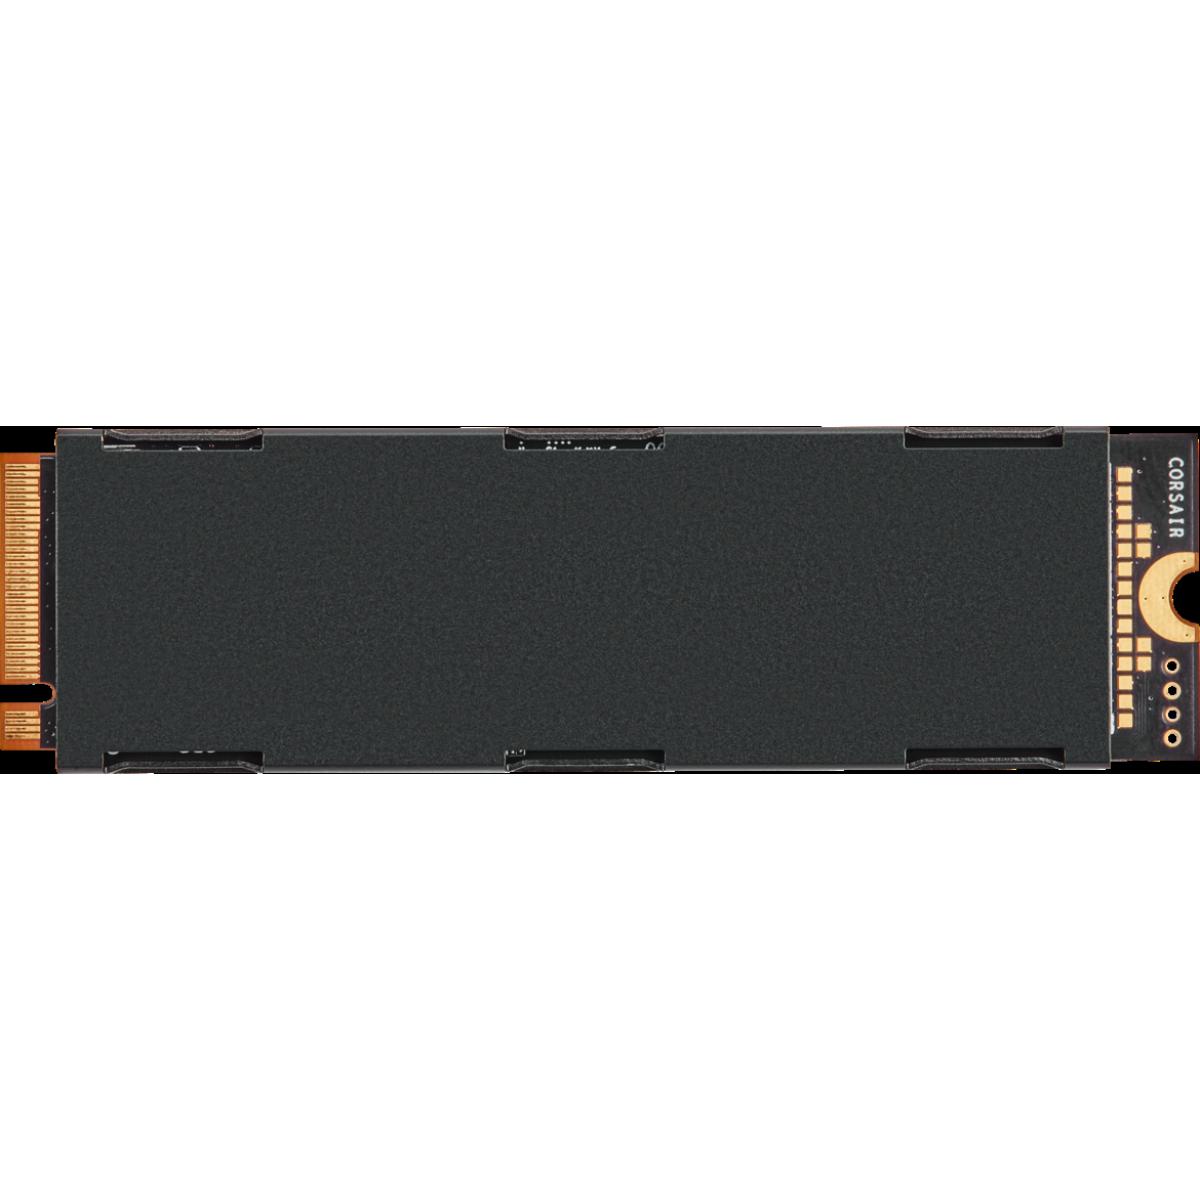 SSD Corsair MP600 1TB, M.2 2280, Leitura 4.950MBs e Gravação 4.250MBs, CSSD-F1000GBMP600